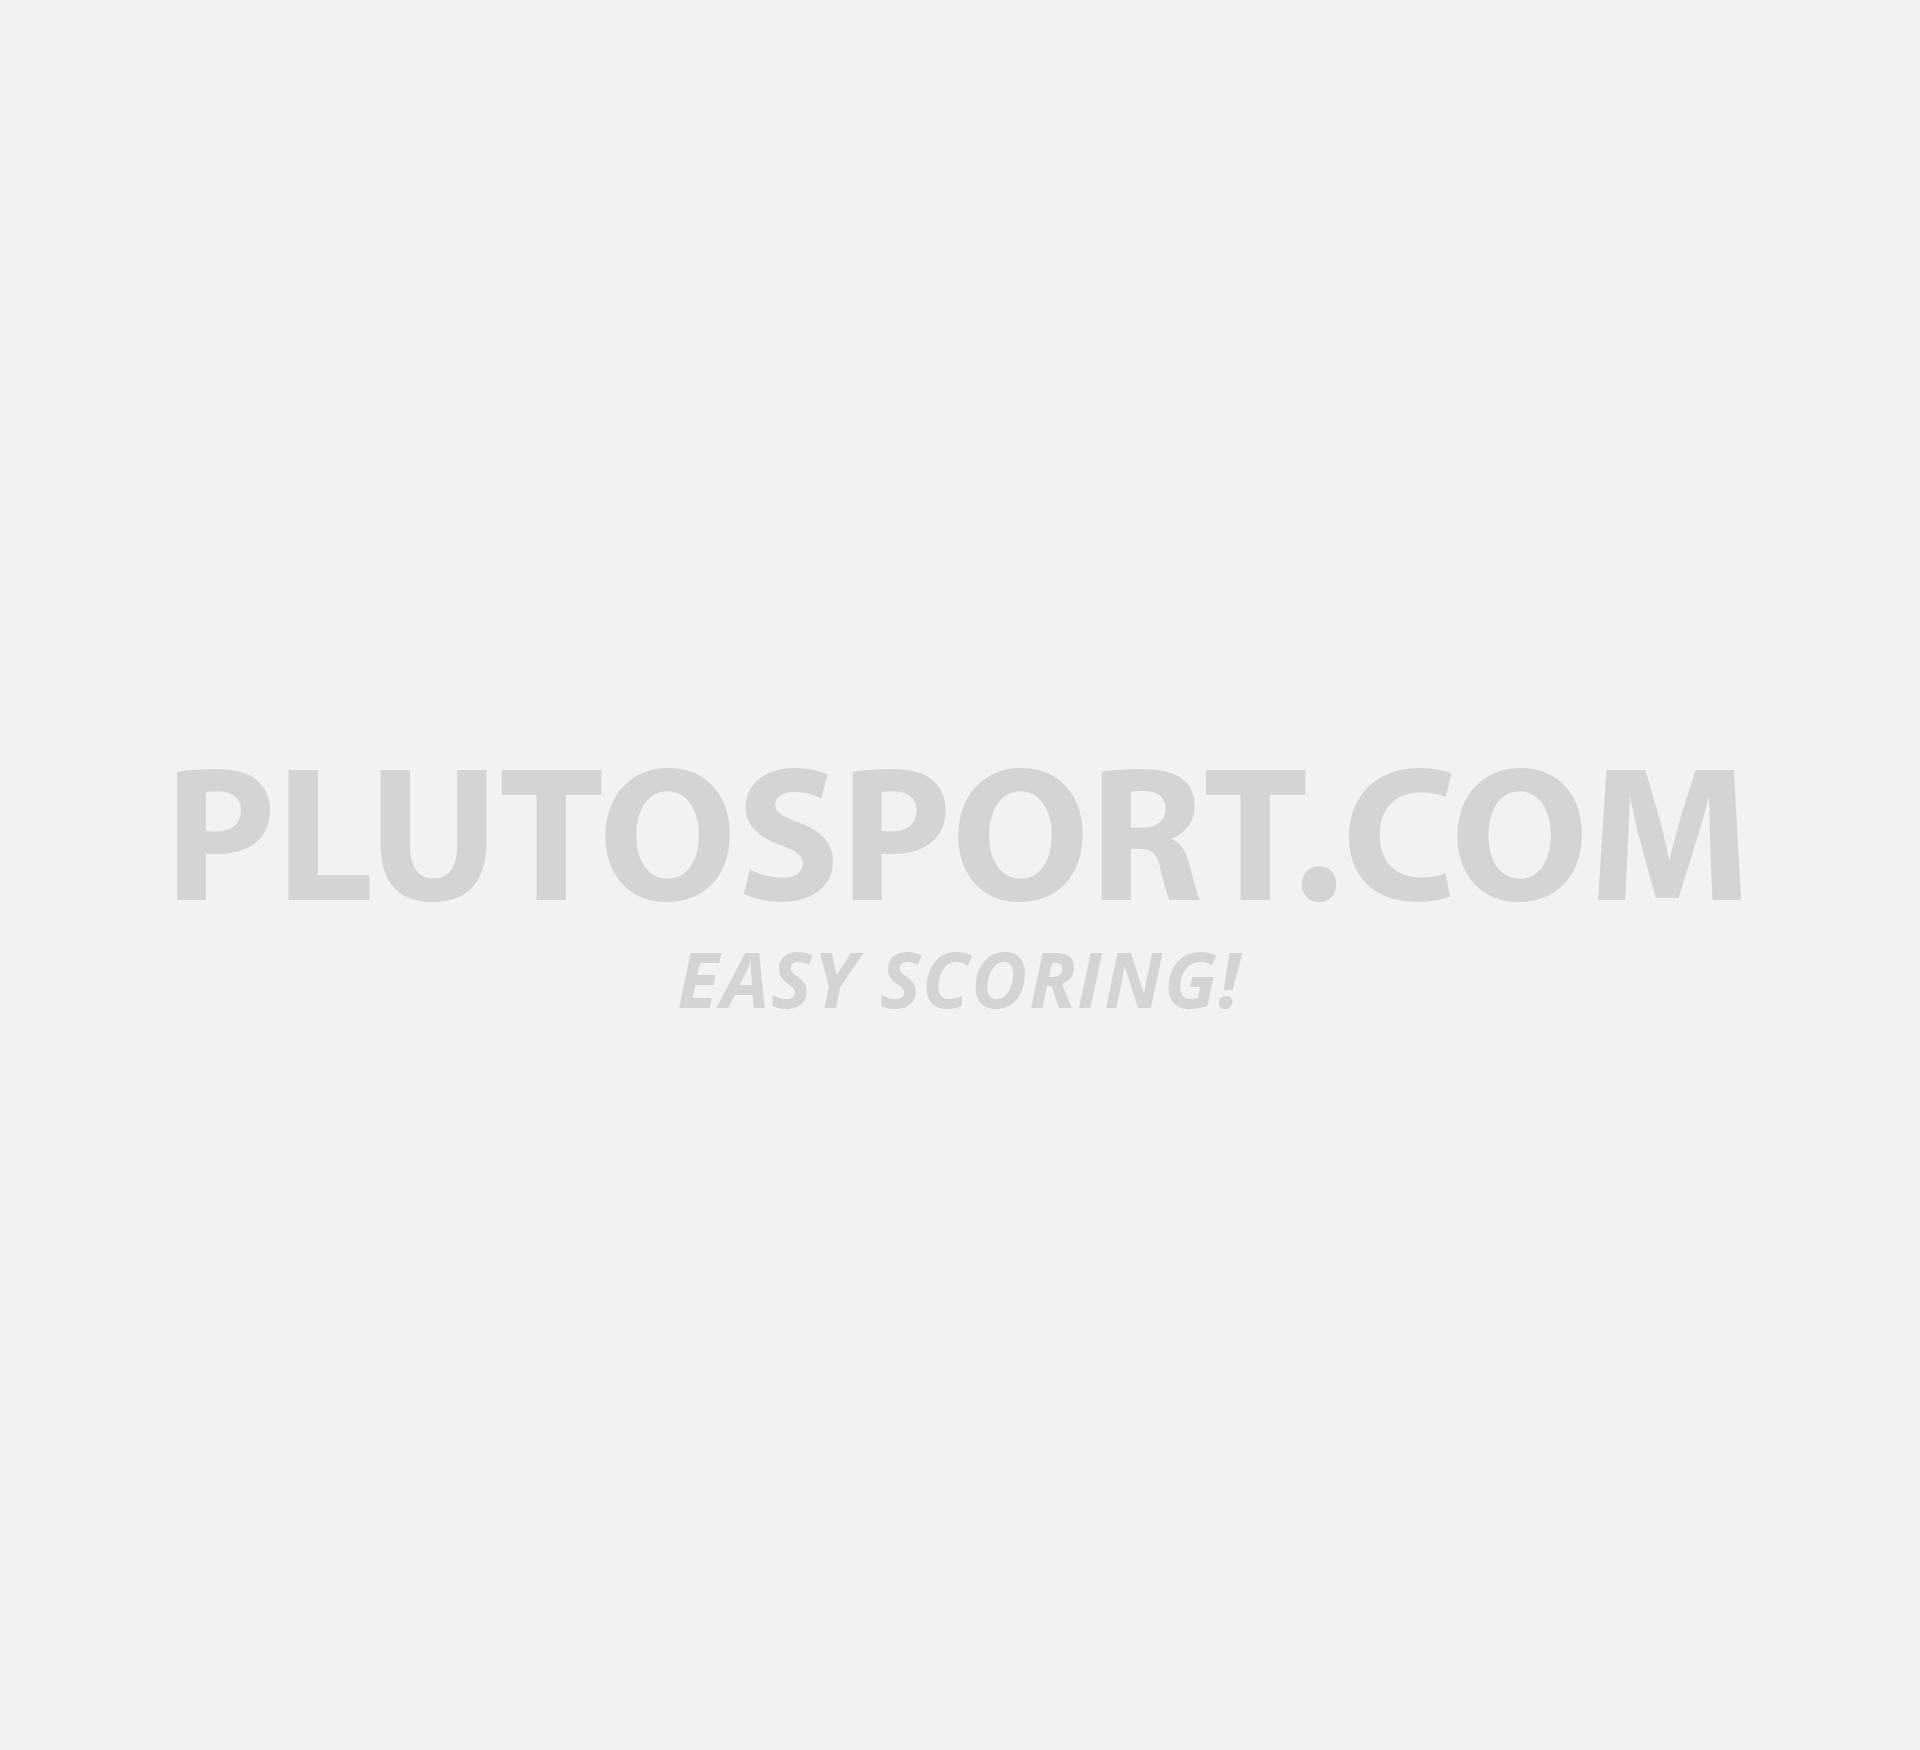 982640e4726a Puma evoPOWER Vigor 3 Graphic FG - Boots fixed stud - Shoes - Football -  Sports